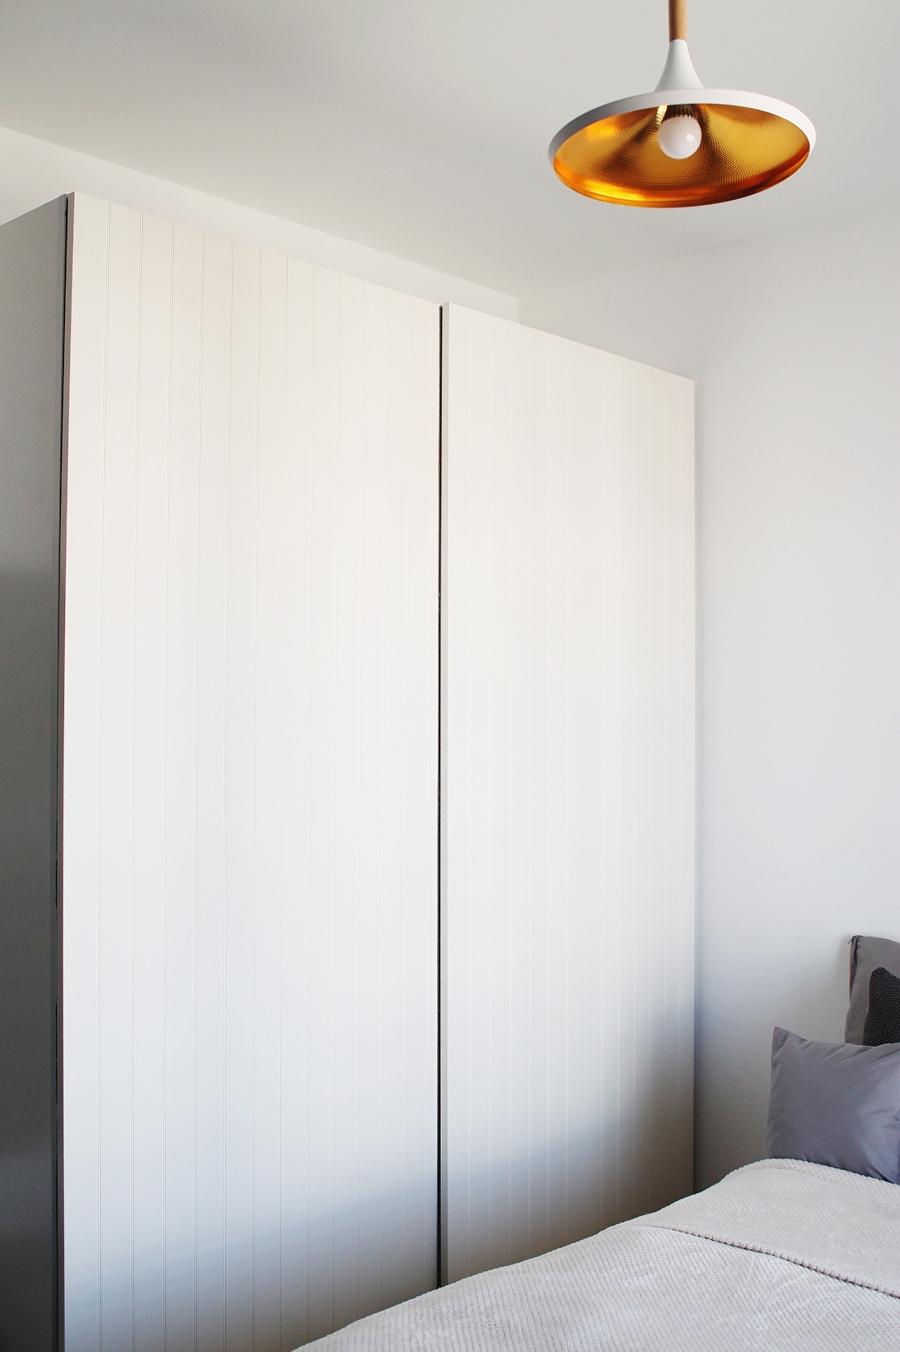 sypialnia - szafa PAX Ikea